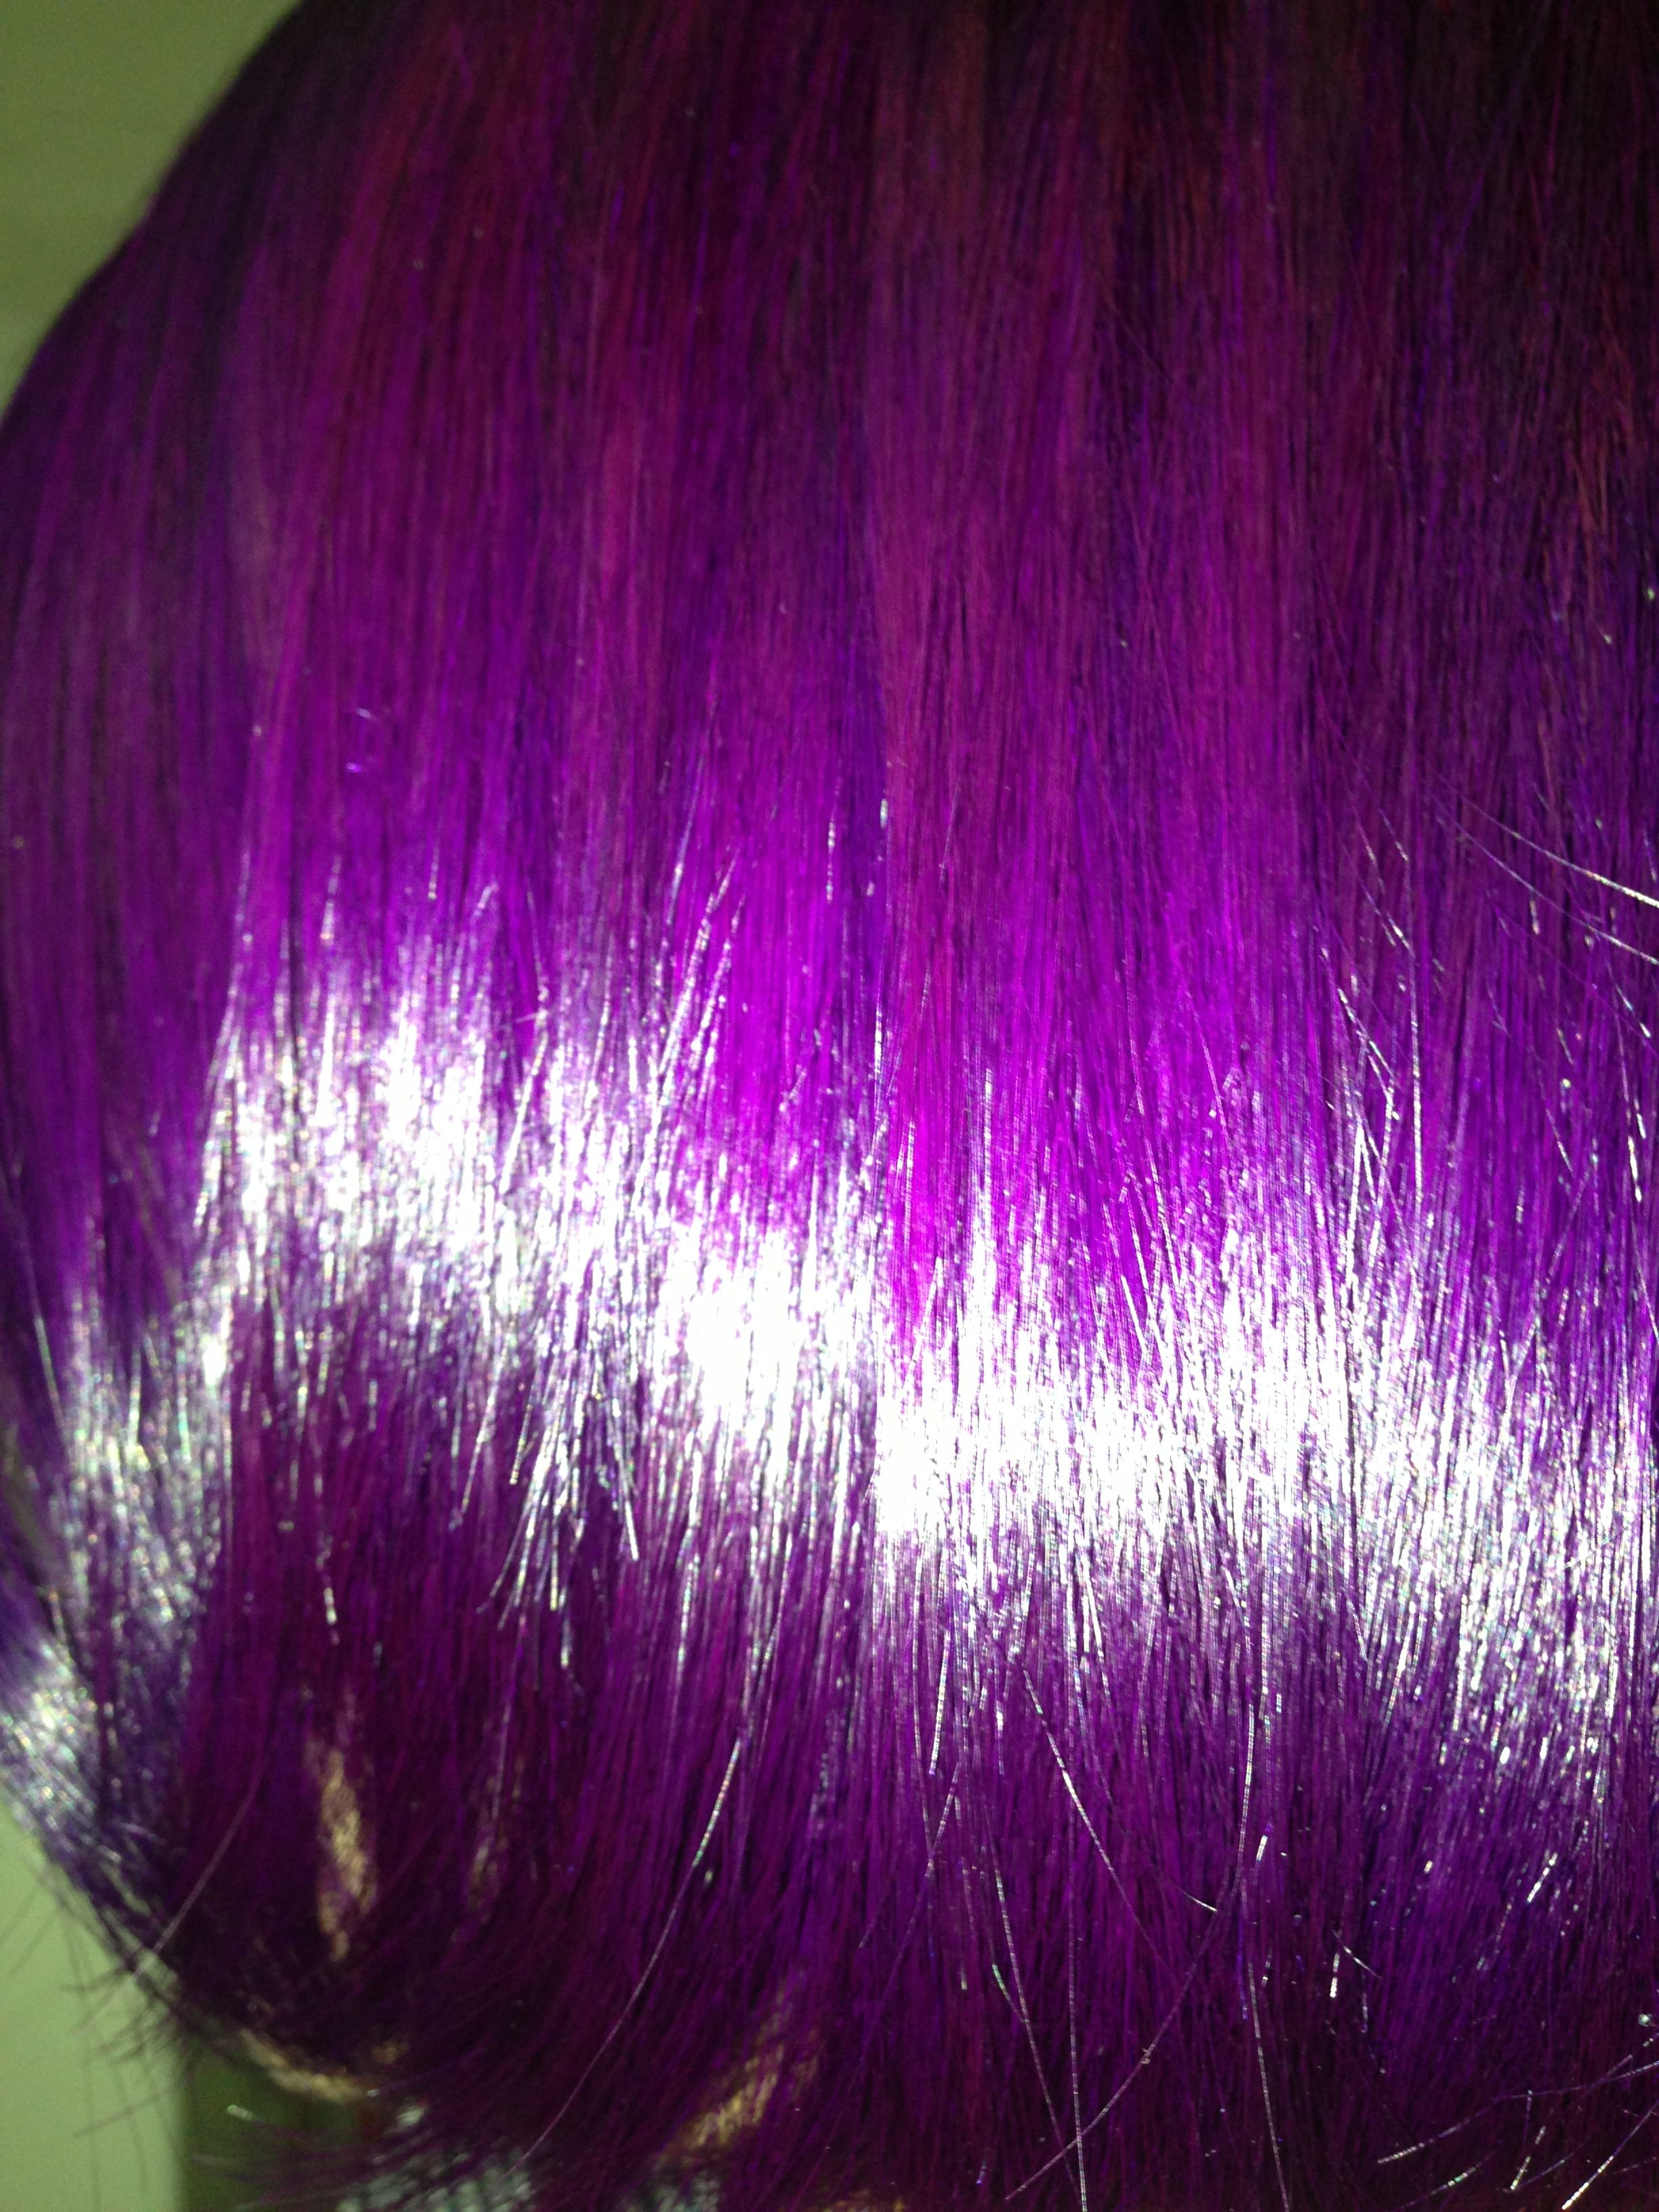 Directions Hair Dye Plumcerise Hair Apparent In 2019 Haarfarben